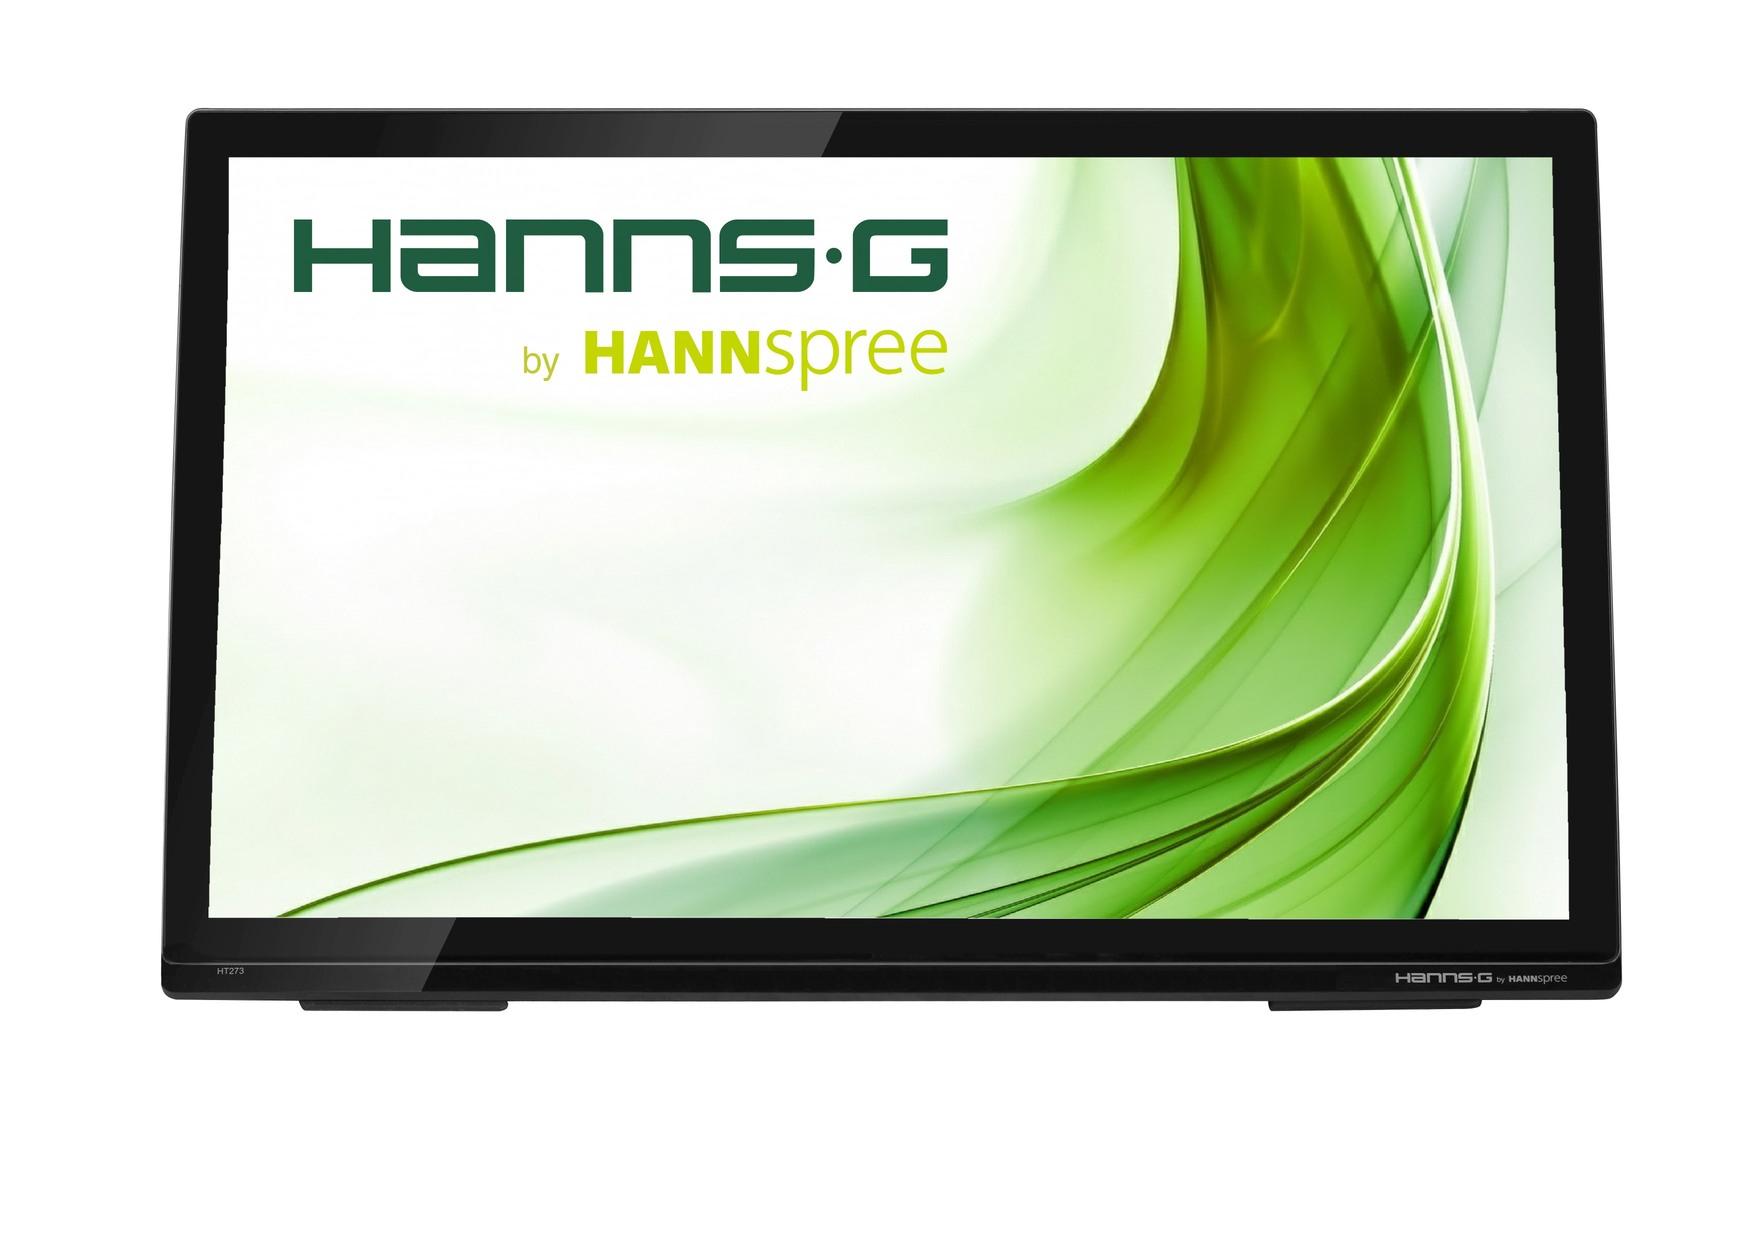 Hannspree Hanns.G HT273HPB touch screen monitor